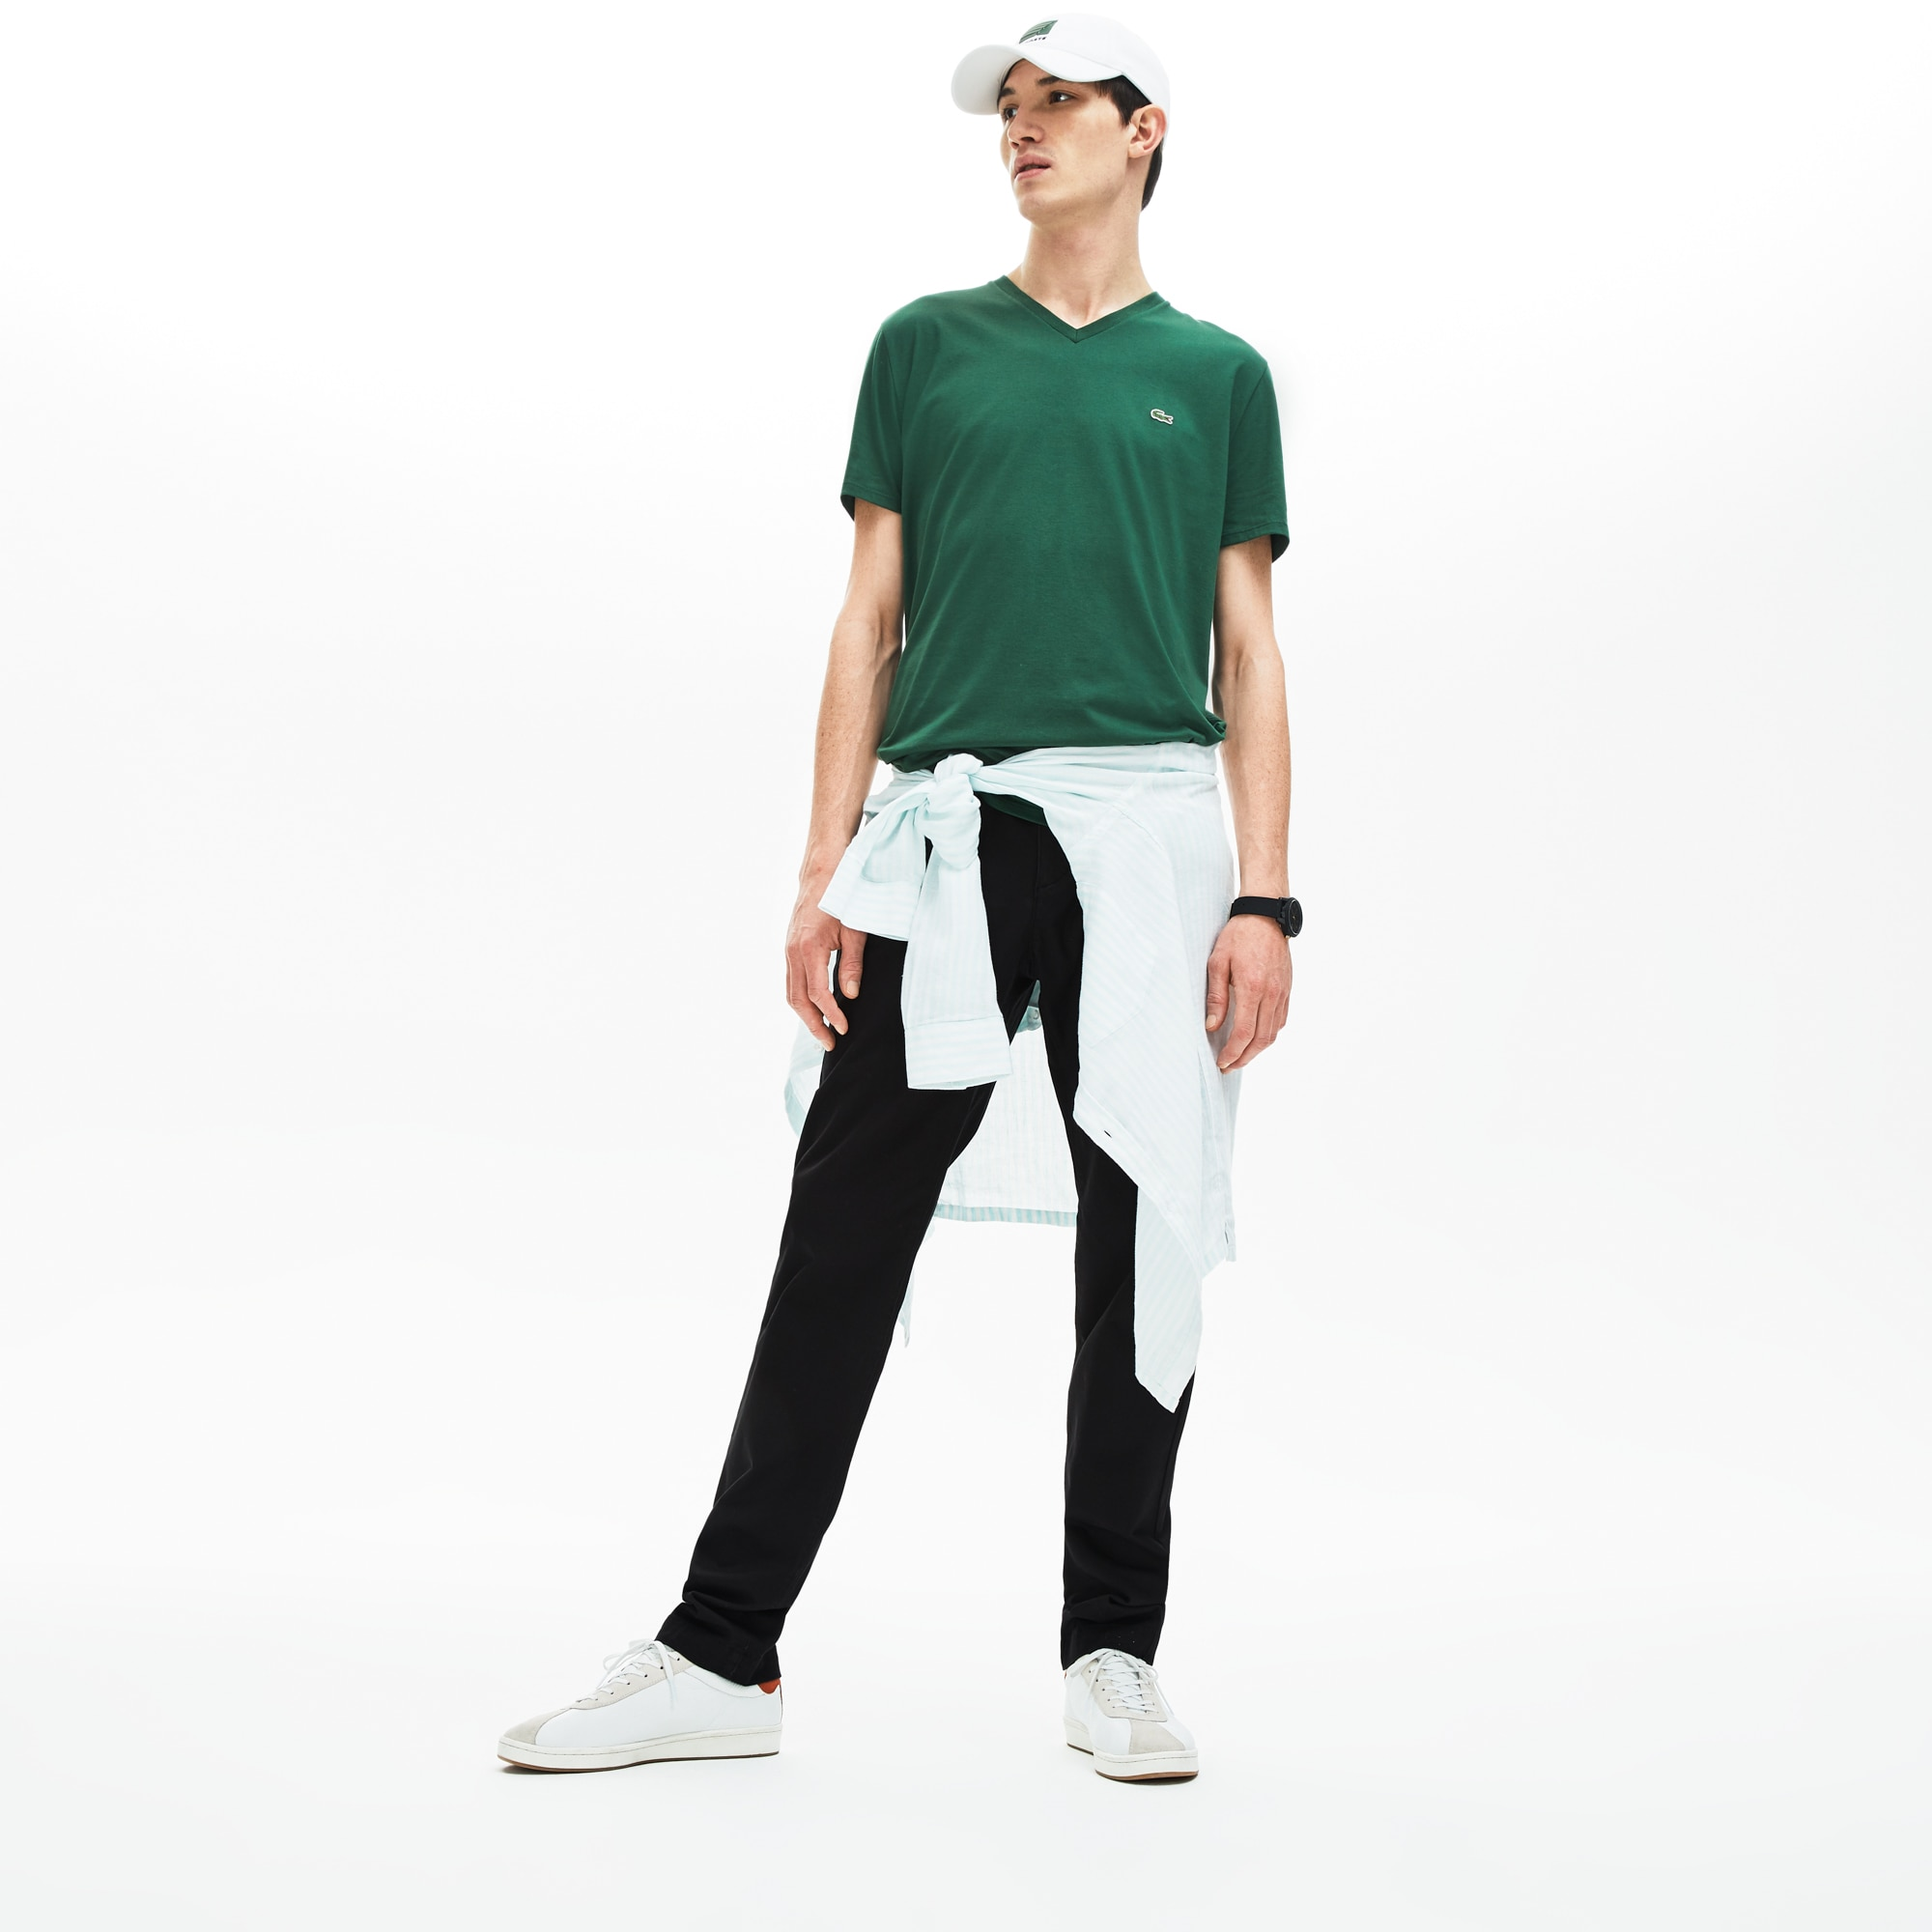 980338a8f3 Men's Regular Fit Cotton Gabardine Chino Pants